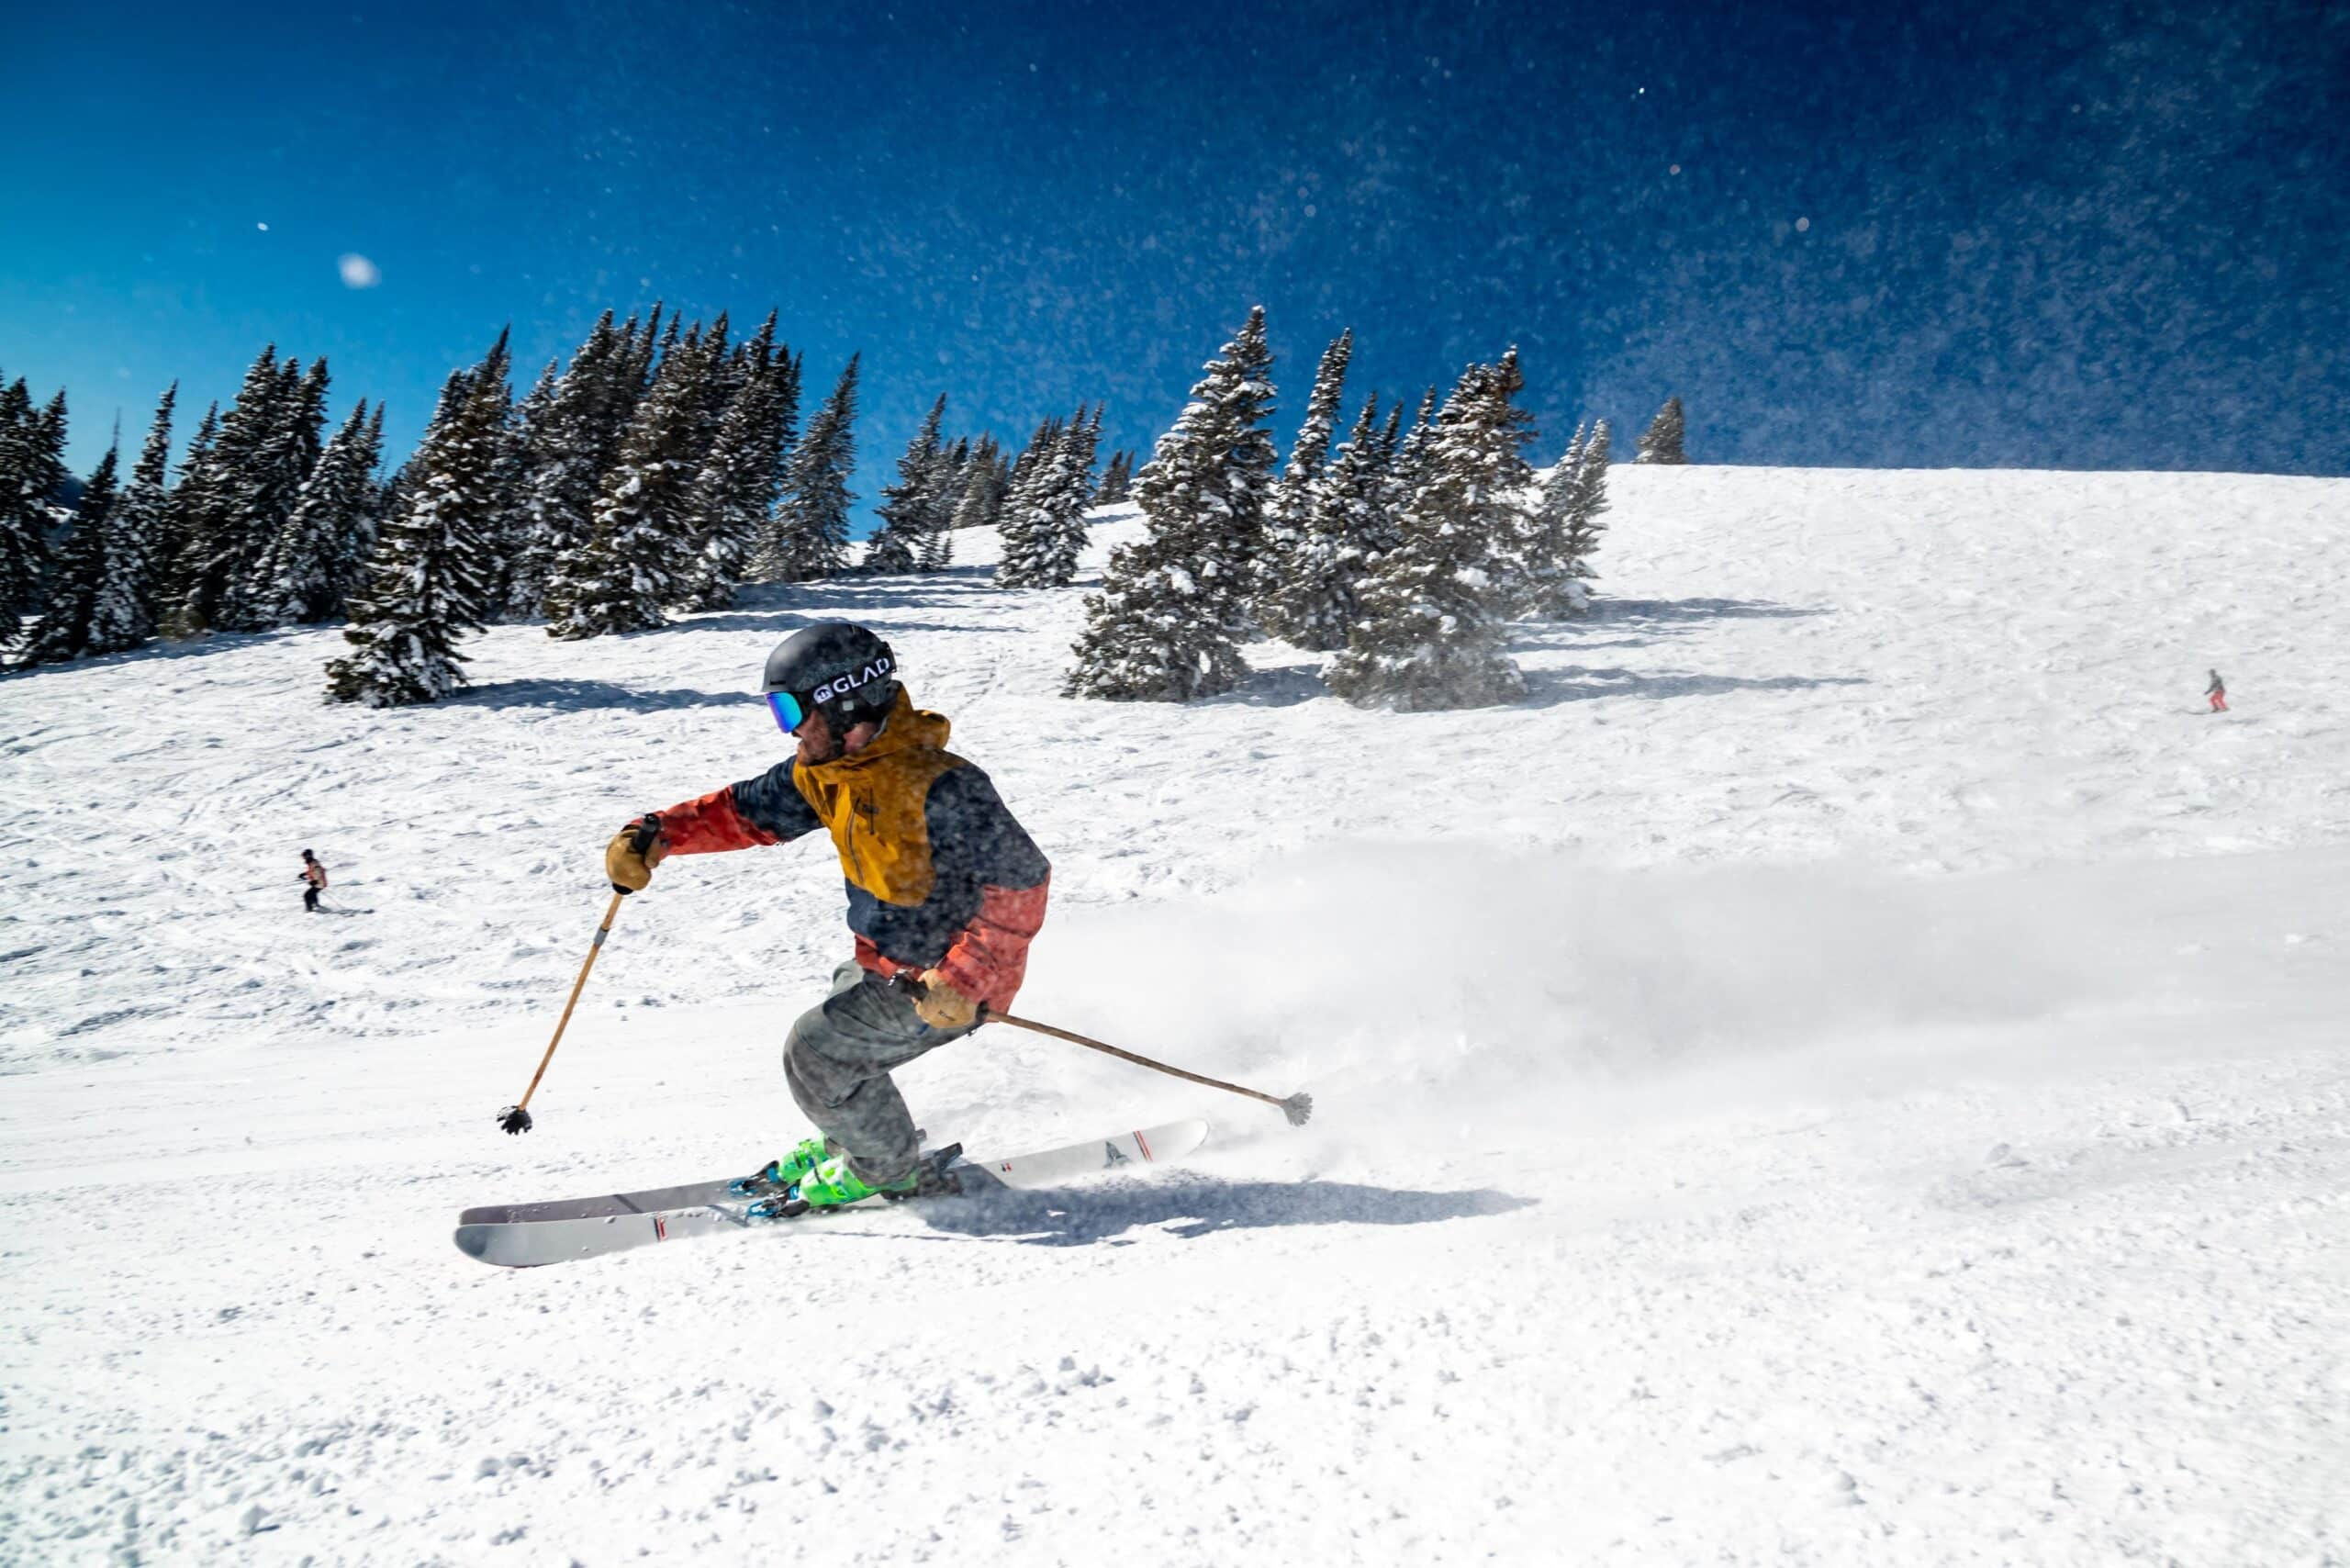 beginner skiier in goggles